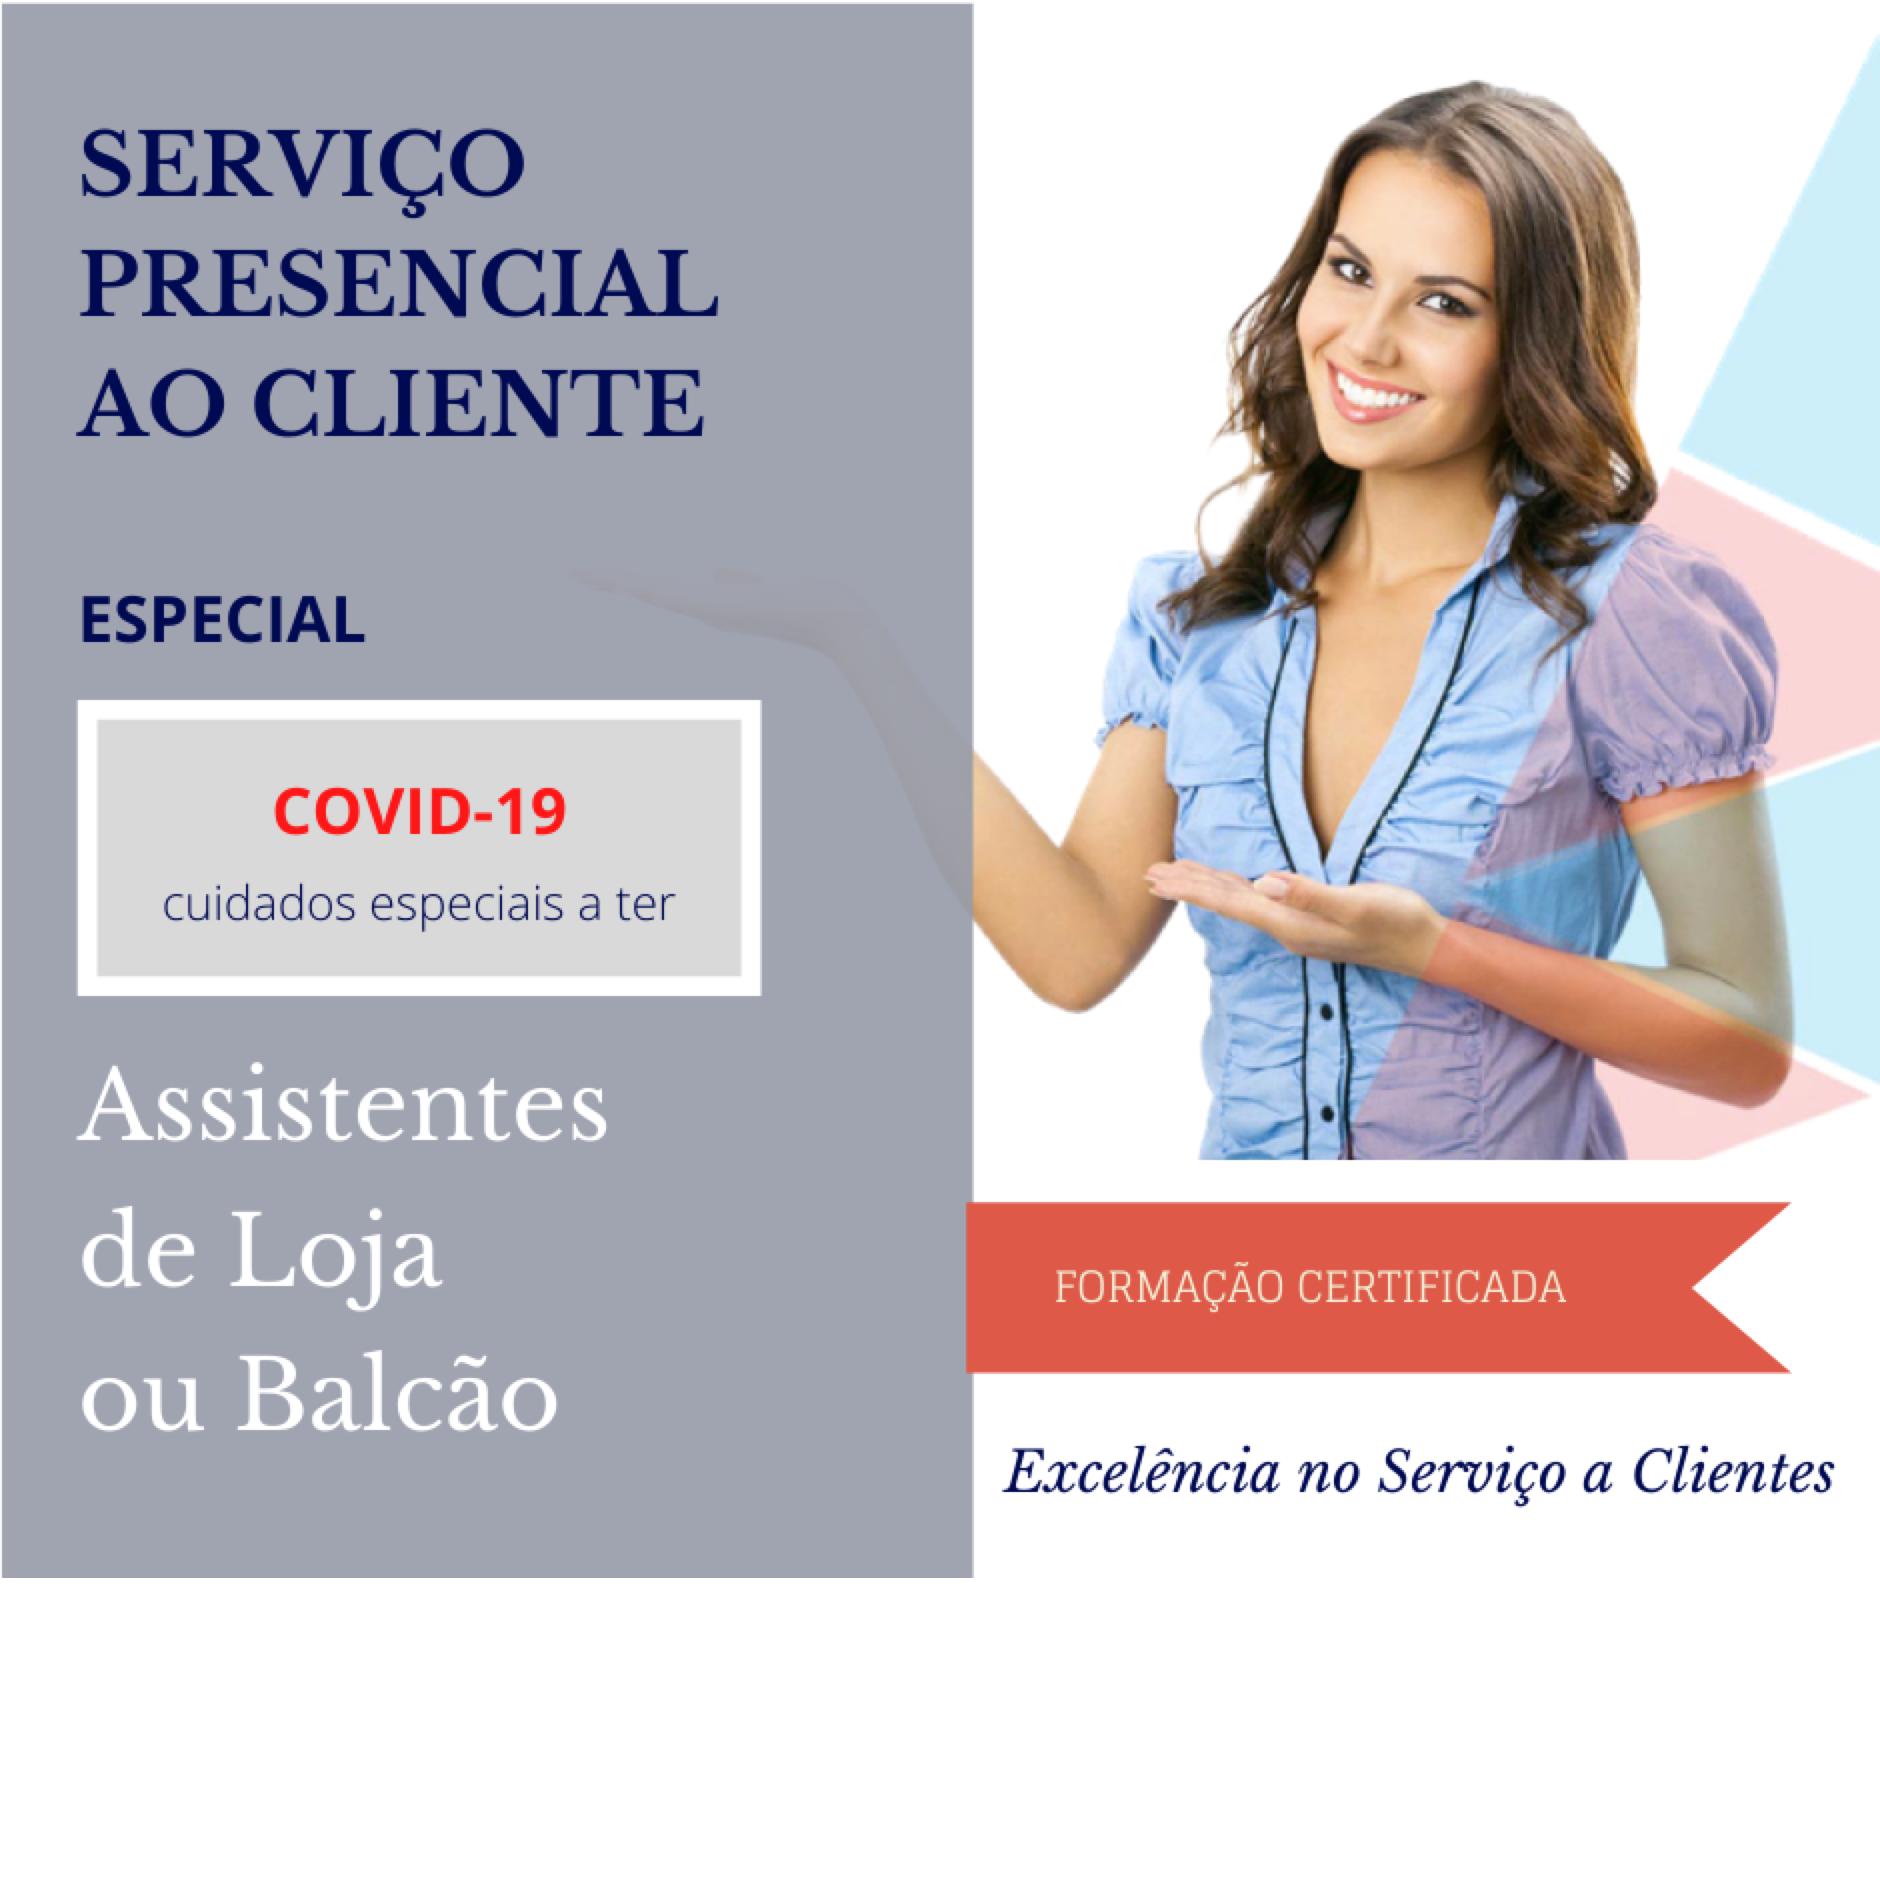 Serviço Presencial vs COVID-19